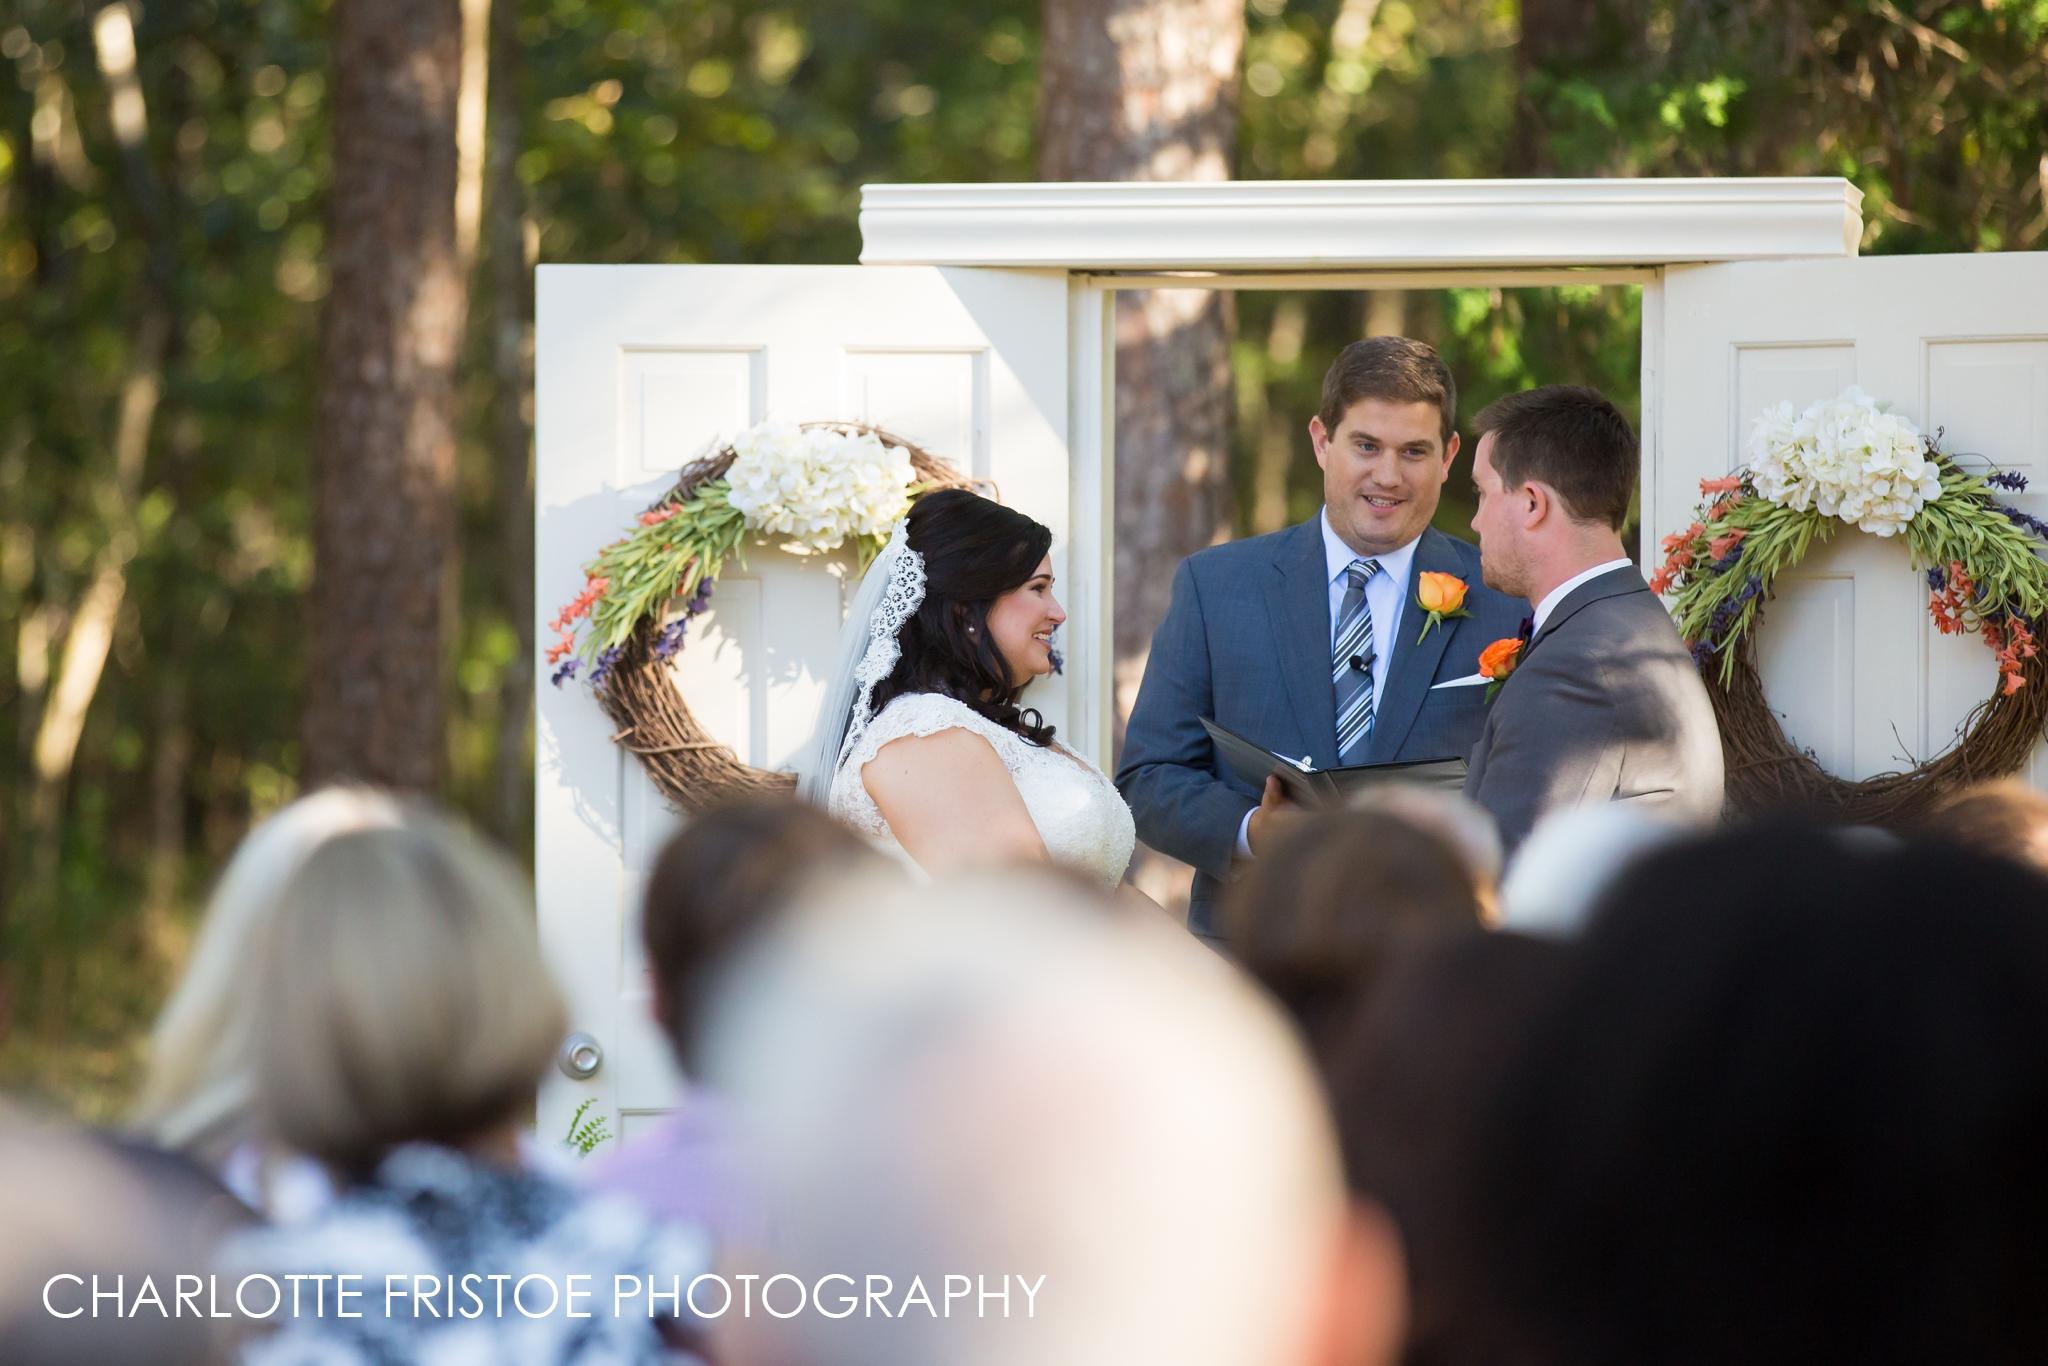 Lake Iamonia Wedding Charlotte Fristoe Photography-36.jpg